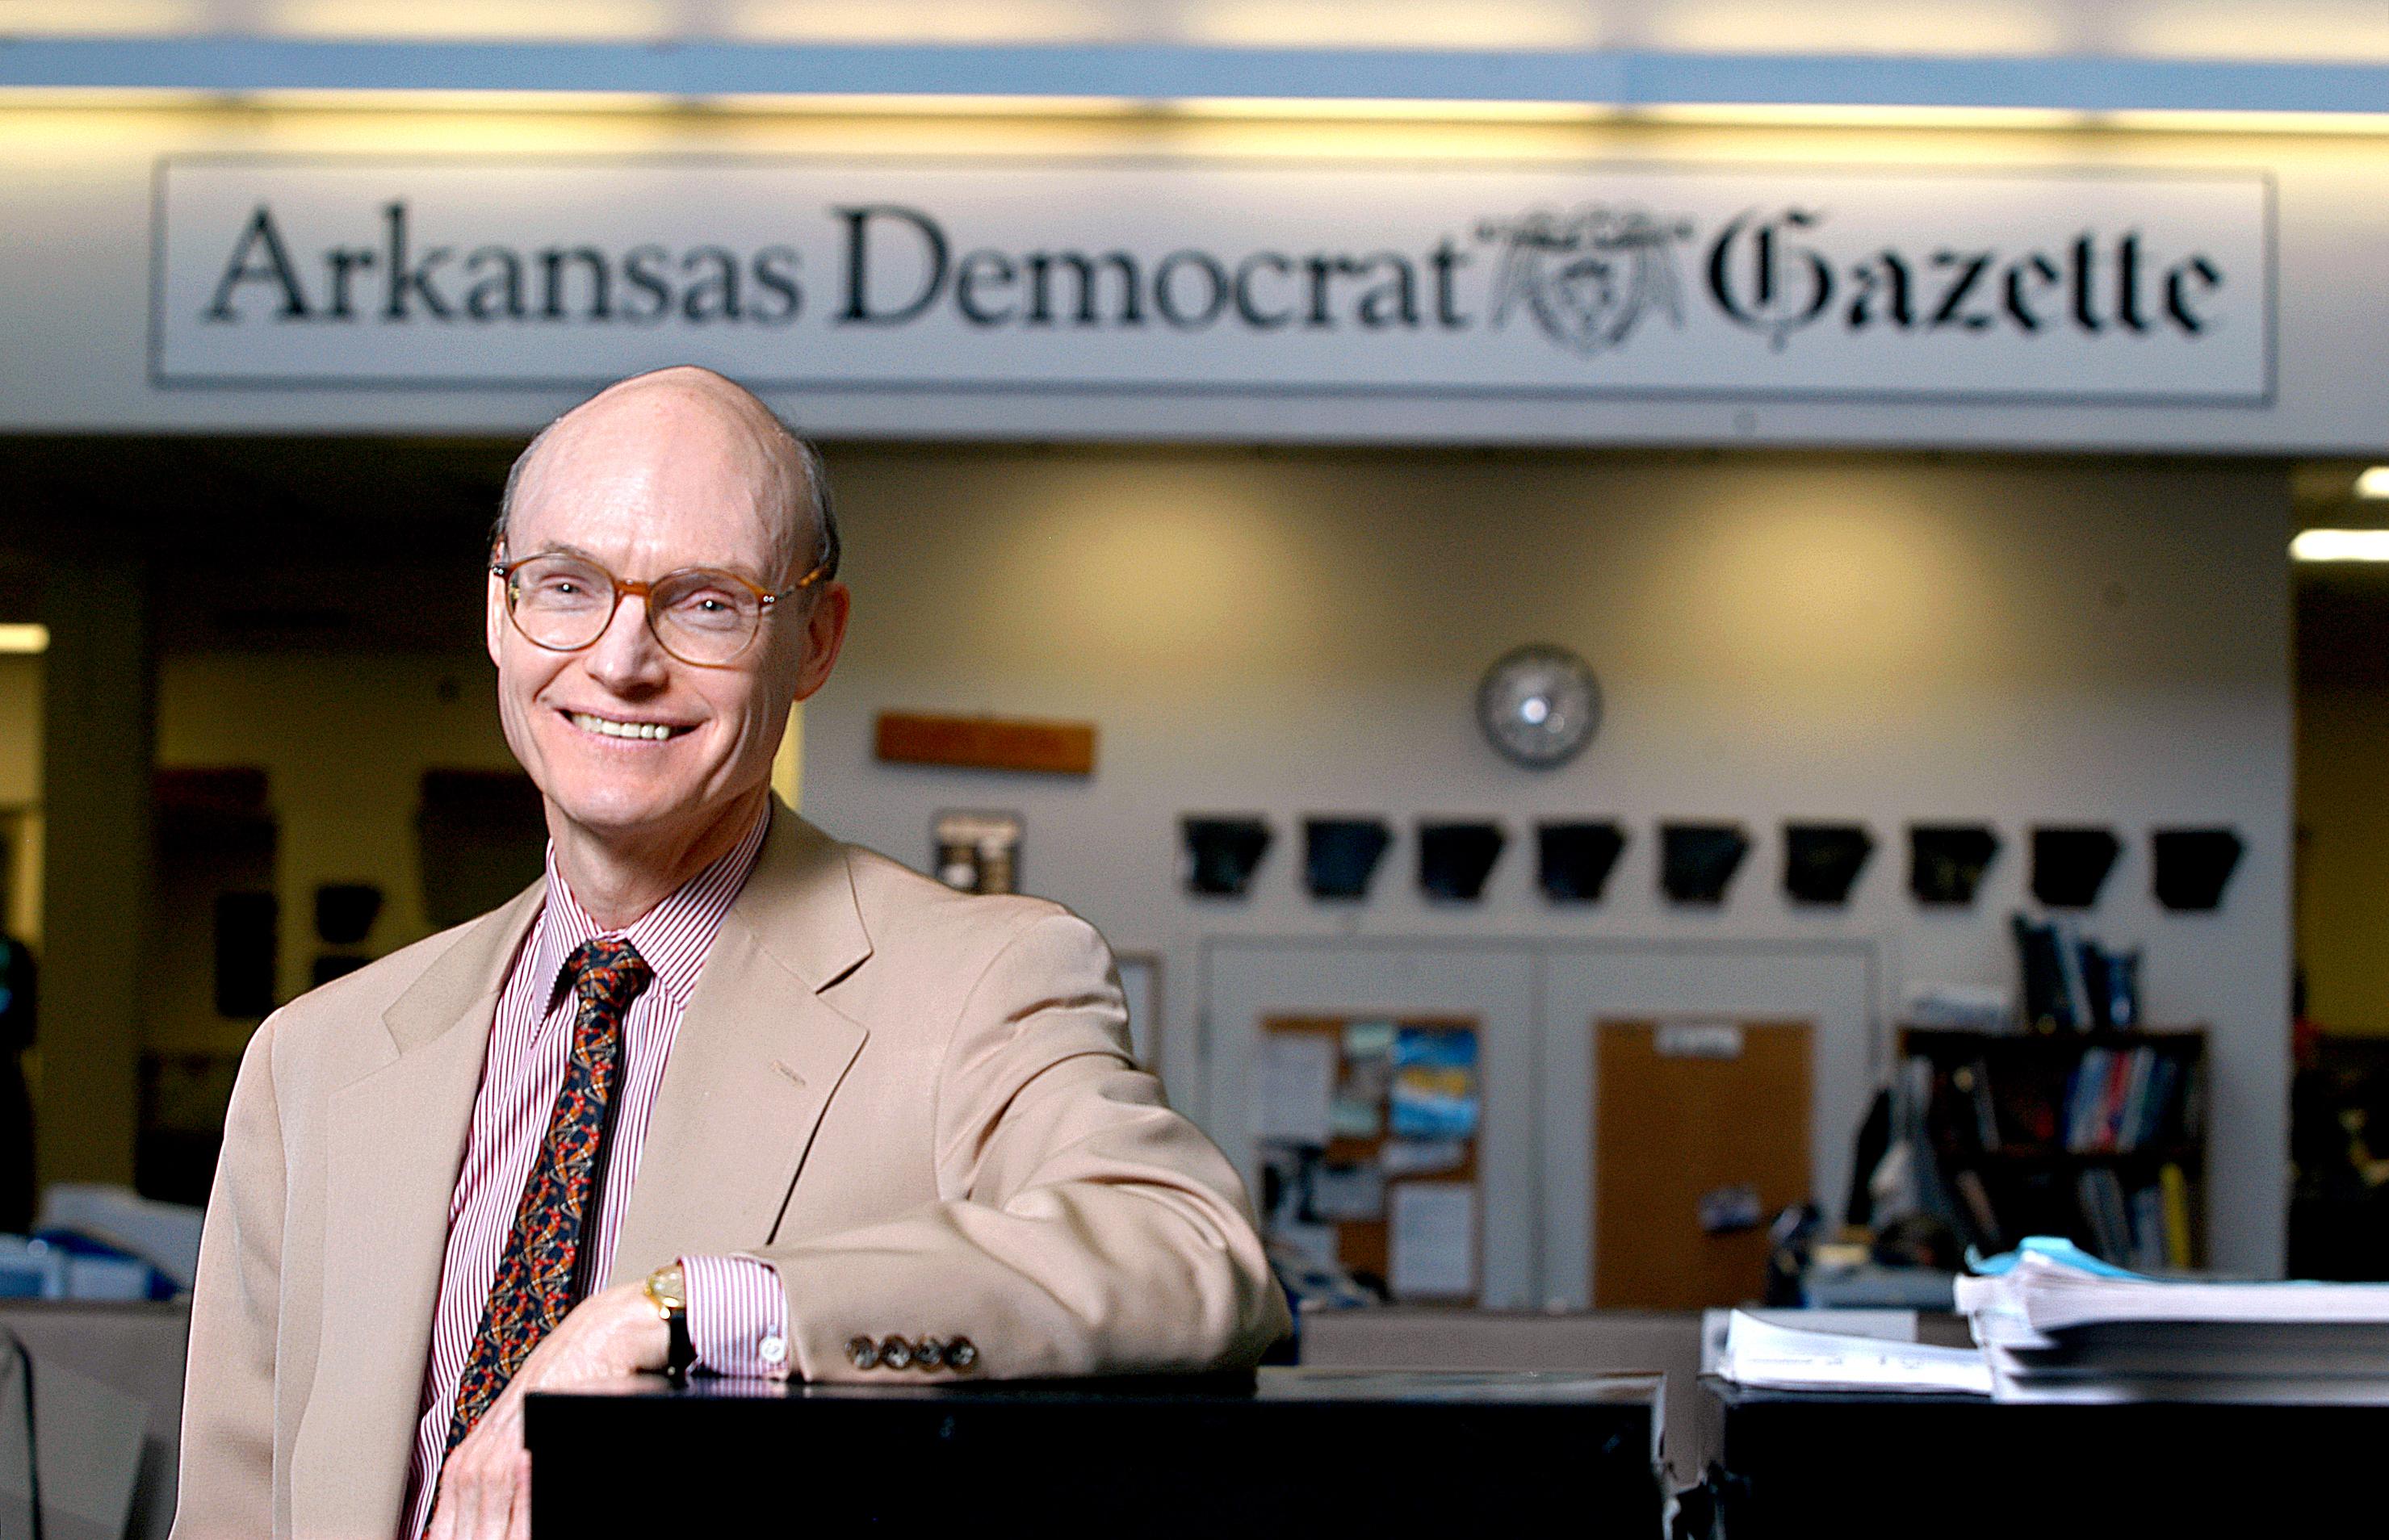 Arkansas Democrat-Gazette is Going Digital